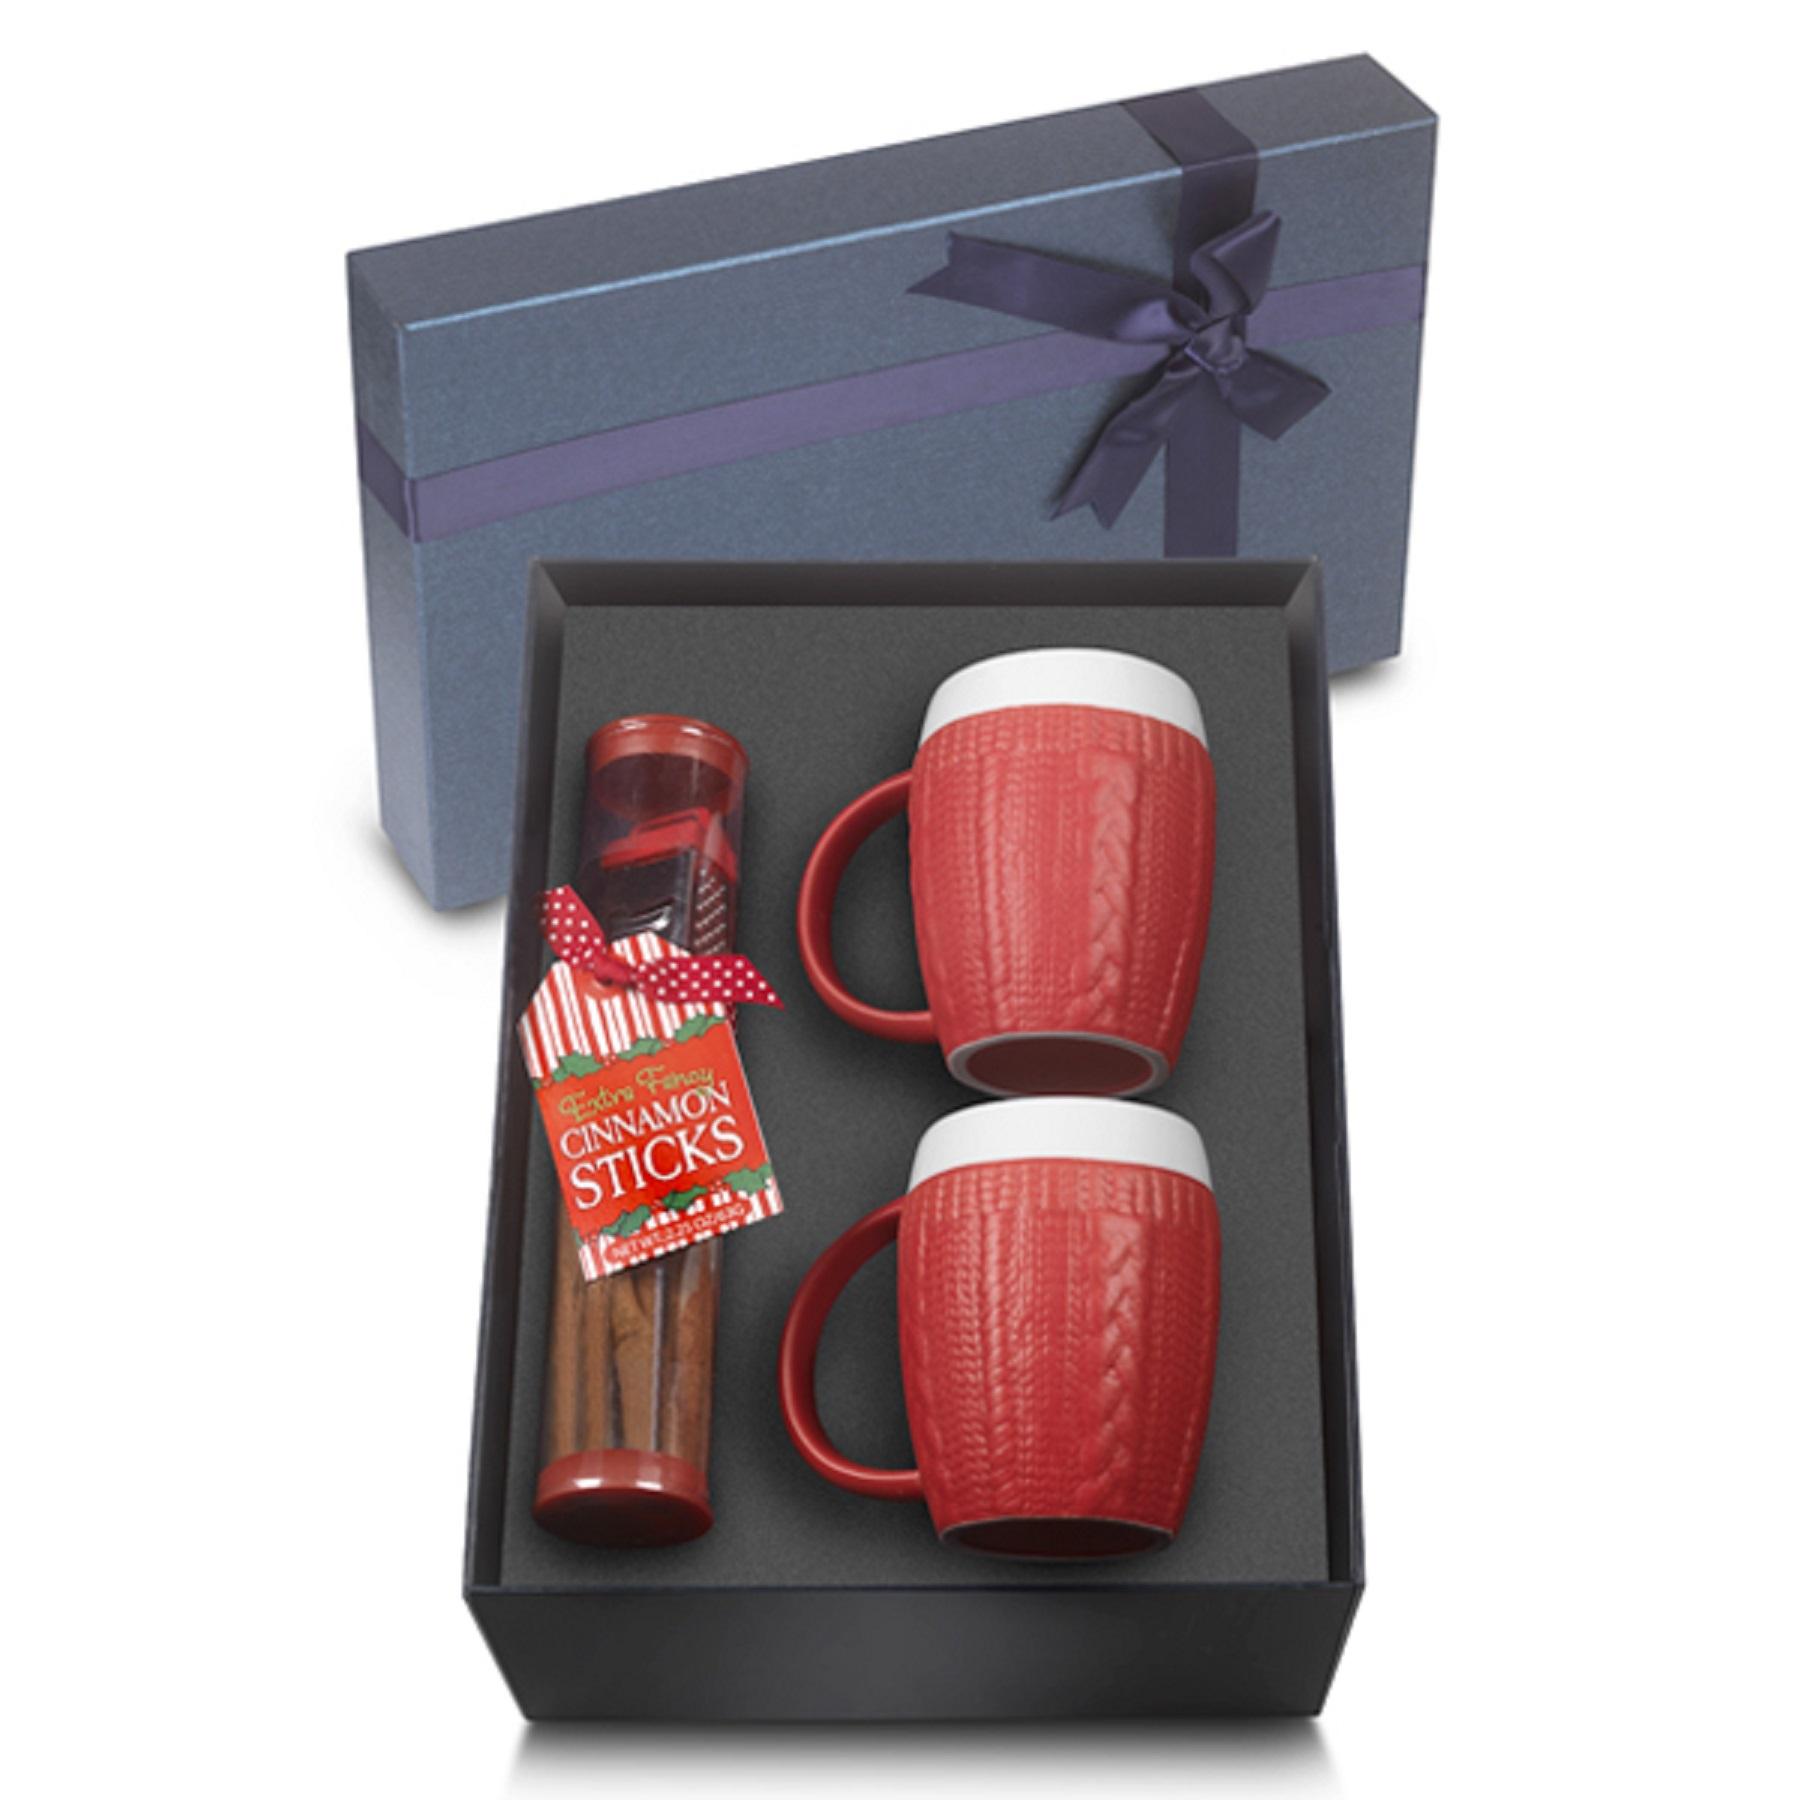 574939830-202 - Two Set 12 Oz. Matte Ceramic Sweater Mugs w/ Cinnamon Sticks - thumbnail